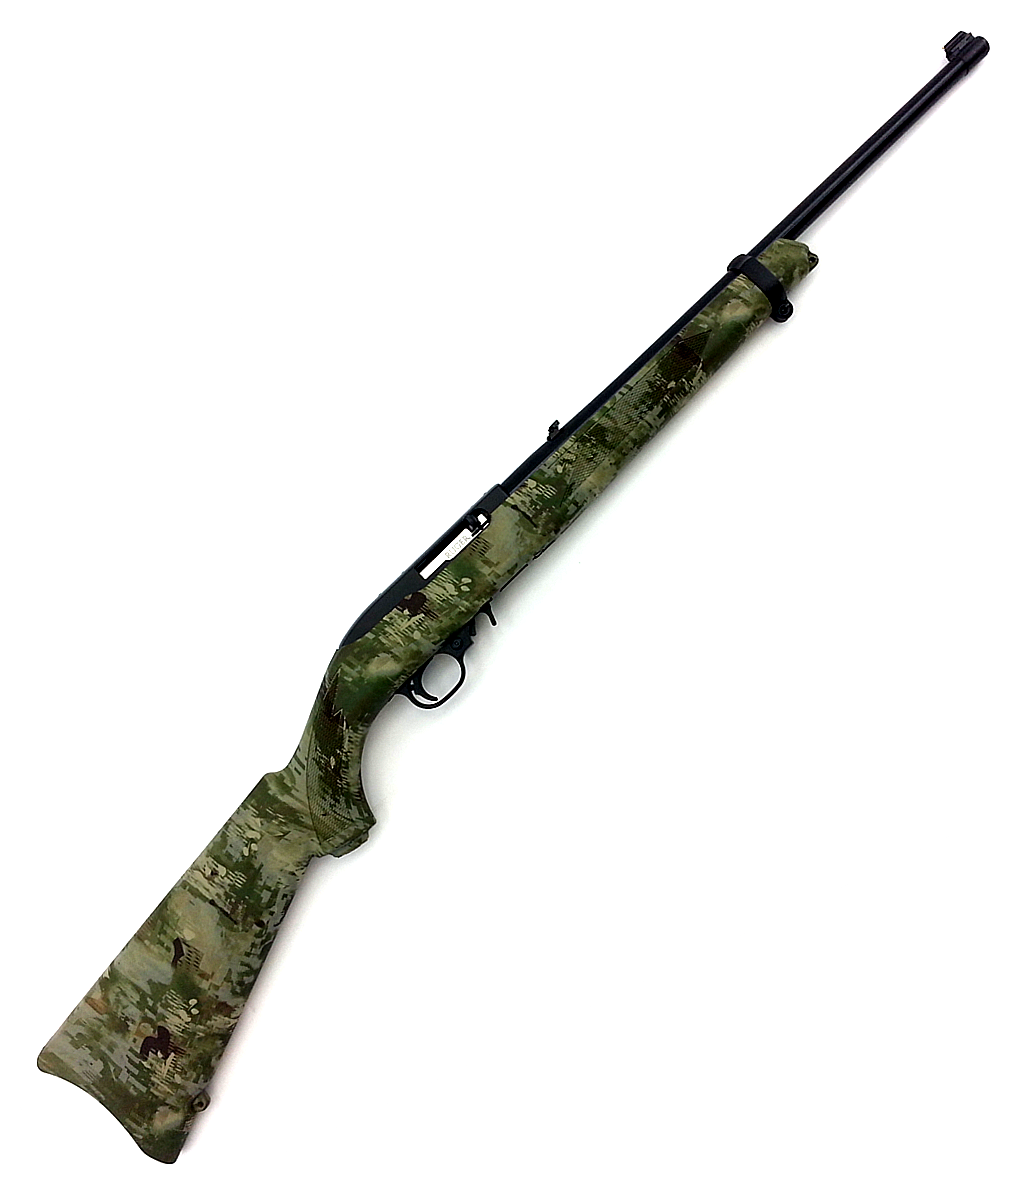 Ruger 10-22 Wolf Camo 22lr Semi-automatic Carbine